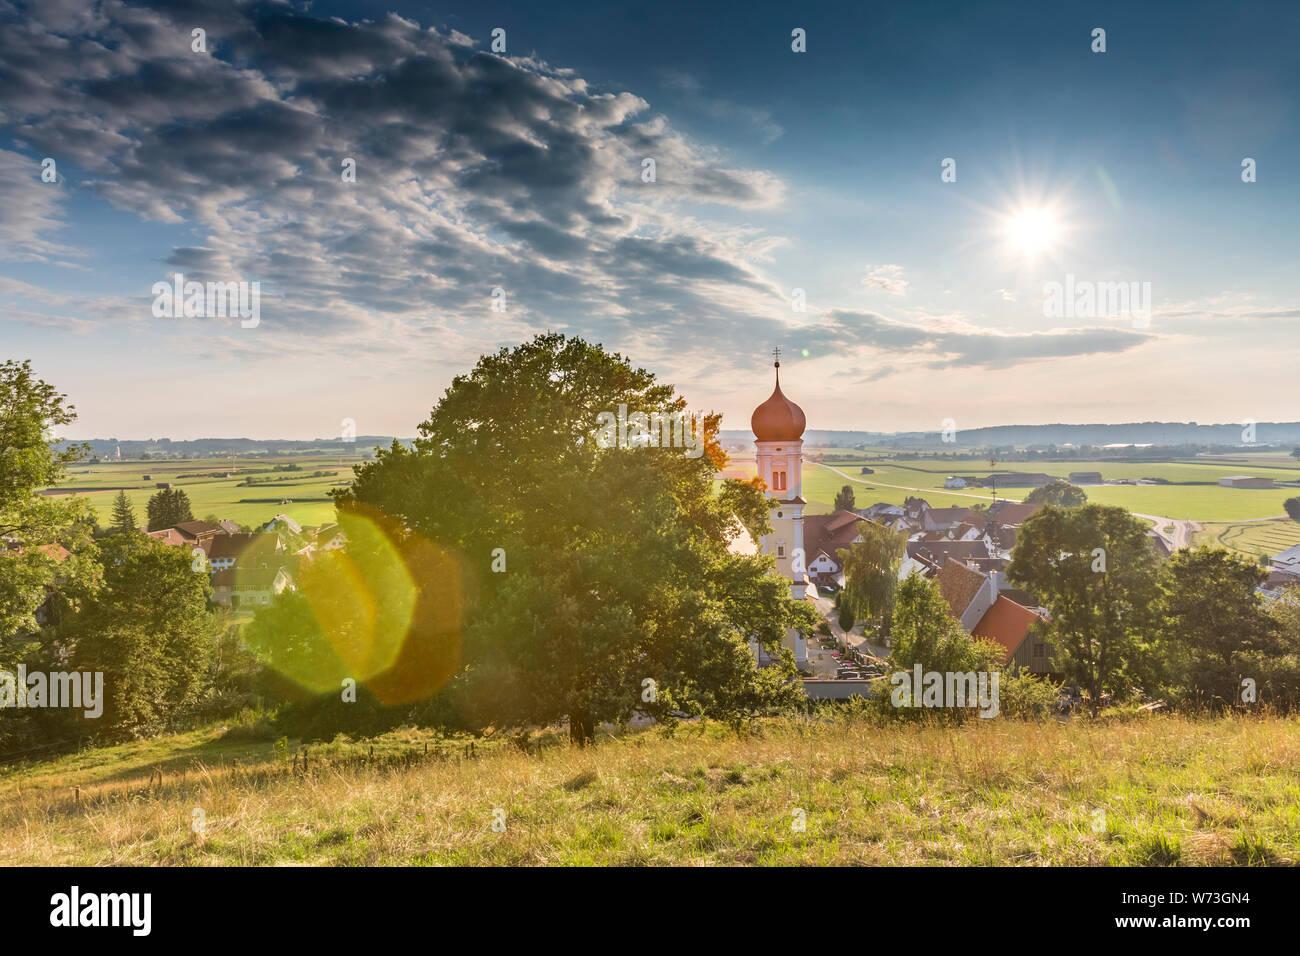 Alemania, Baviera, Allgaeu, Mindelheim, escena rural con la iglesia Foto de stock